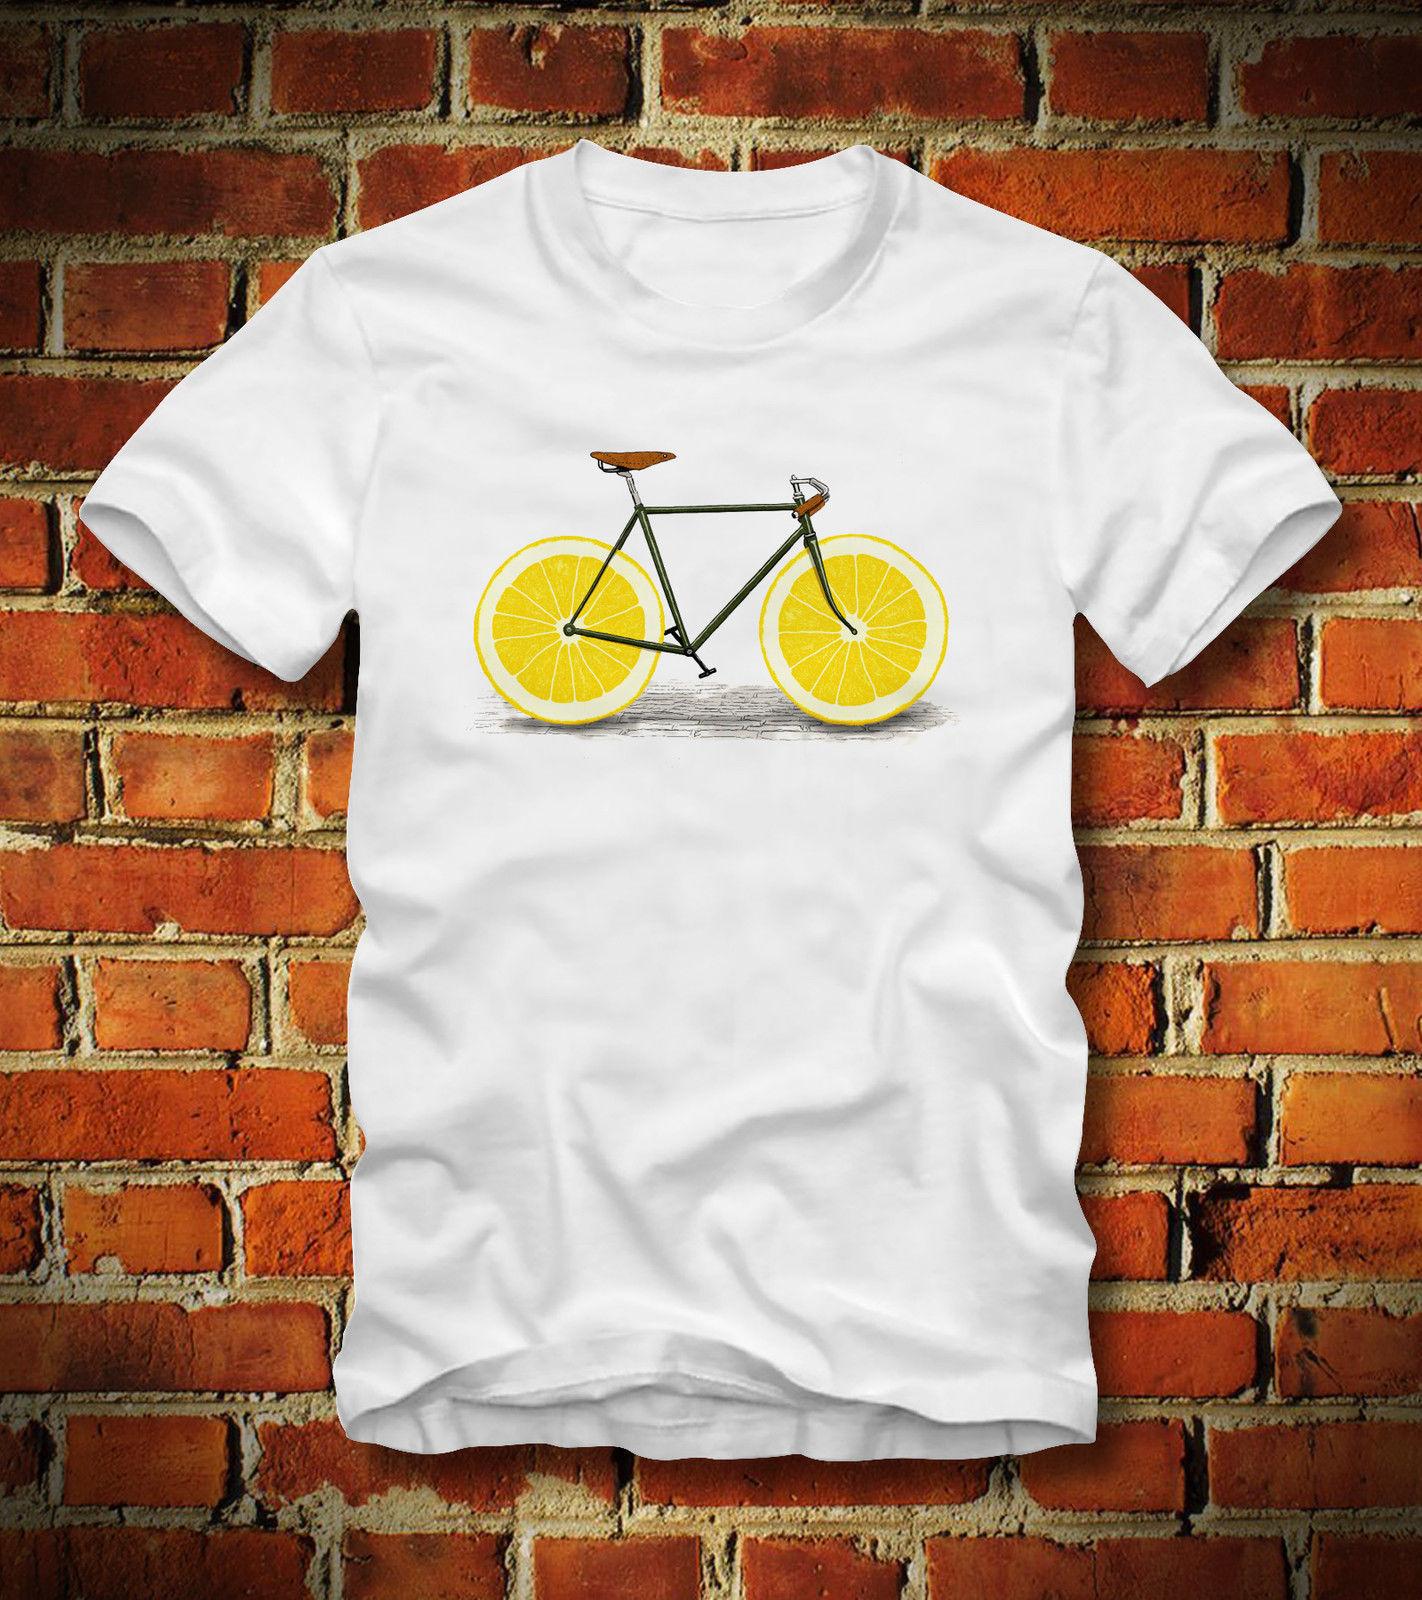 Mode Neue Top Tees T-shirts Neuheit Oansatz Tops Fixie Fahrrad Fahrrad Rennrad Mountainbike graphic Tees